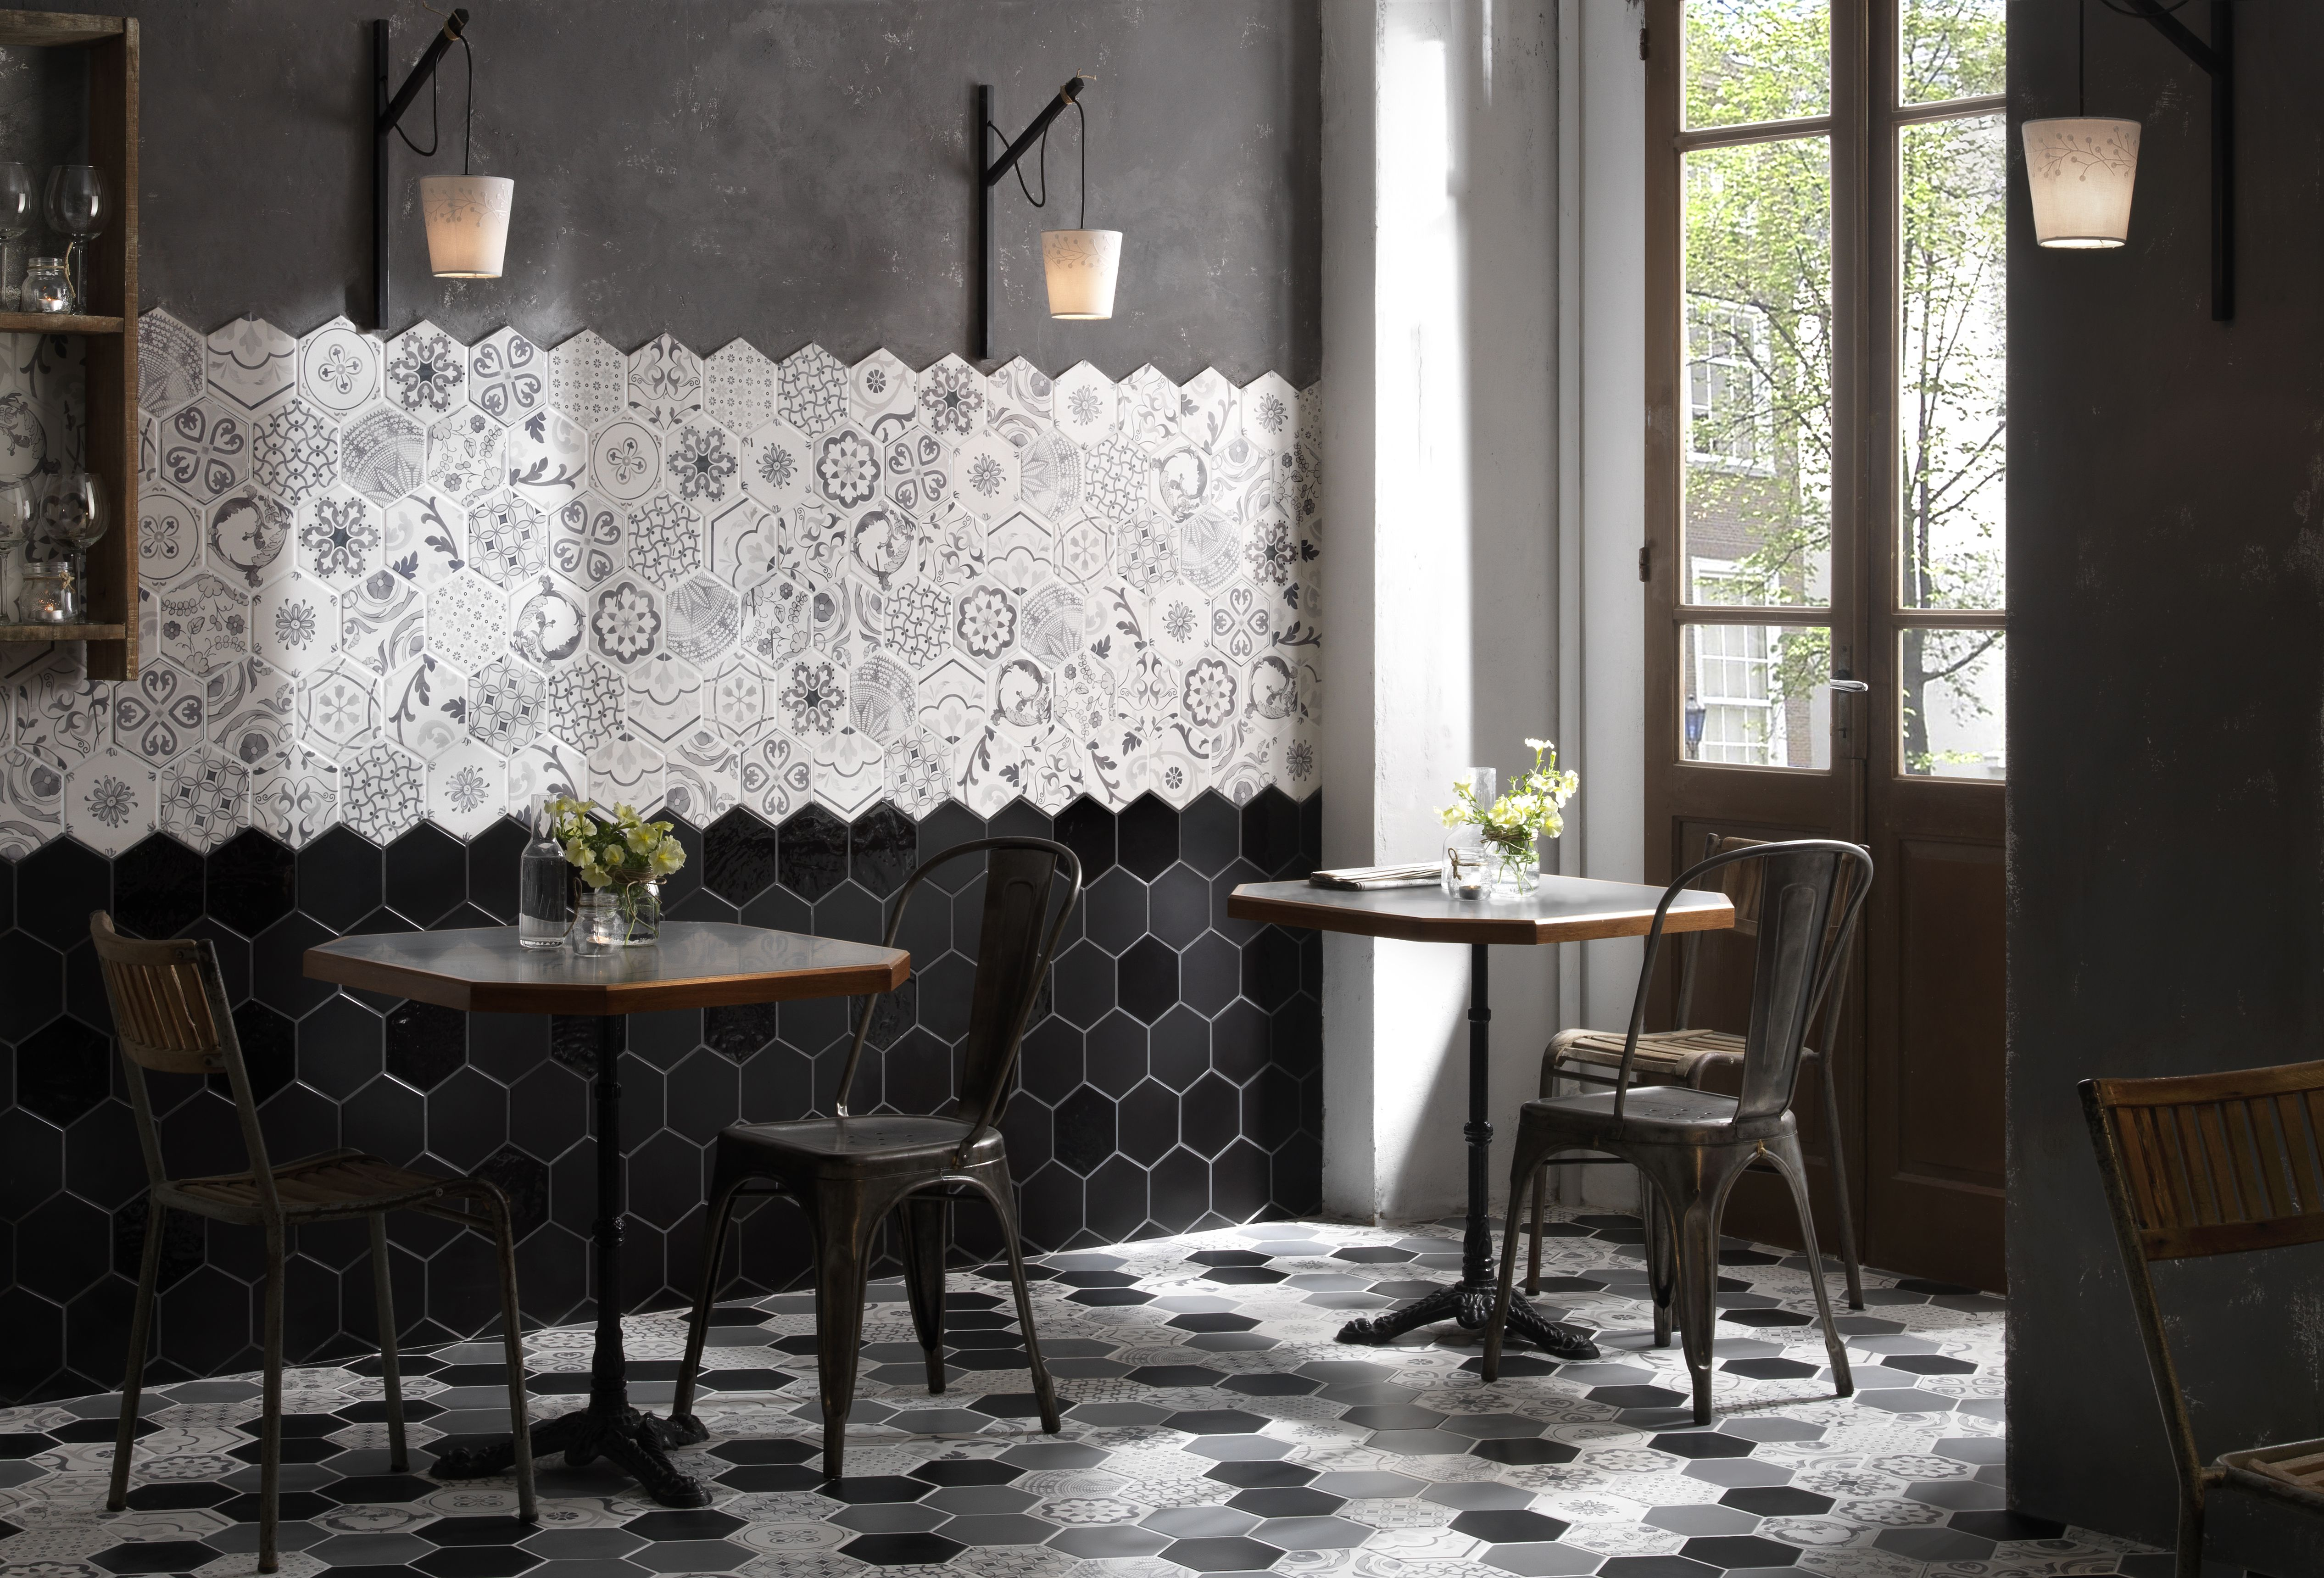 Examatt decoro examix tiles piastrelle walltiles floortiles